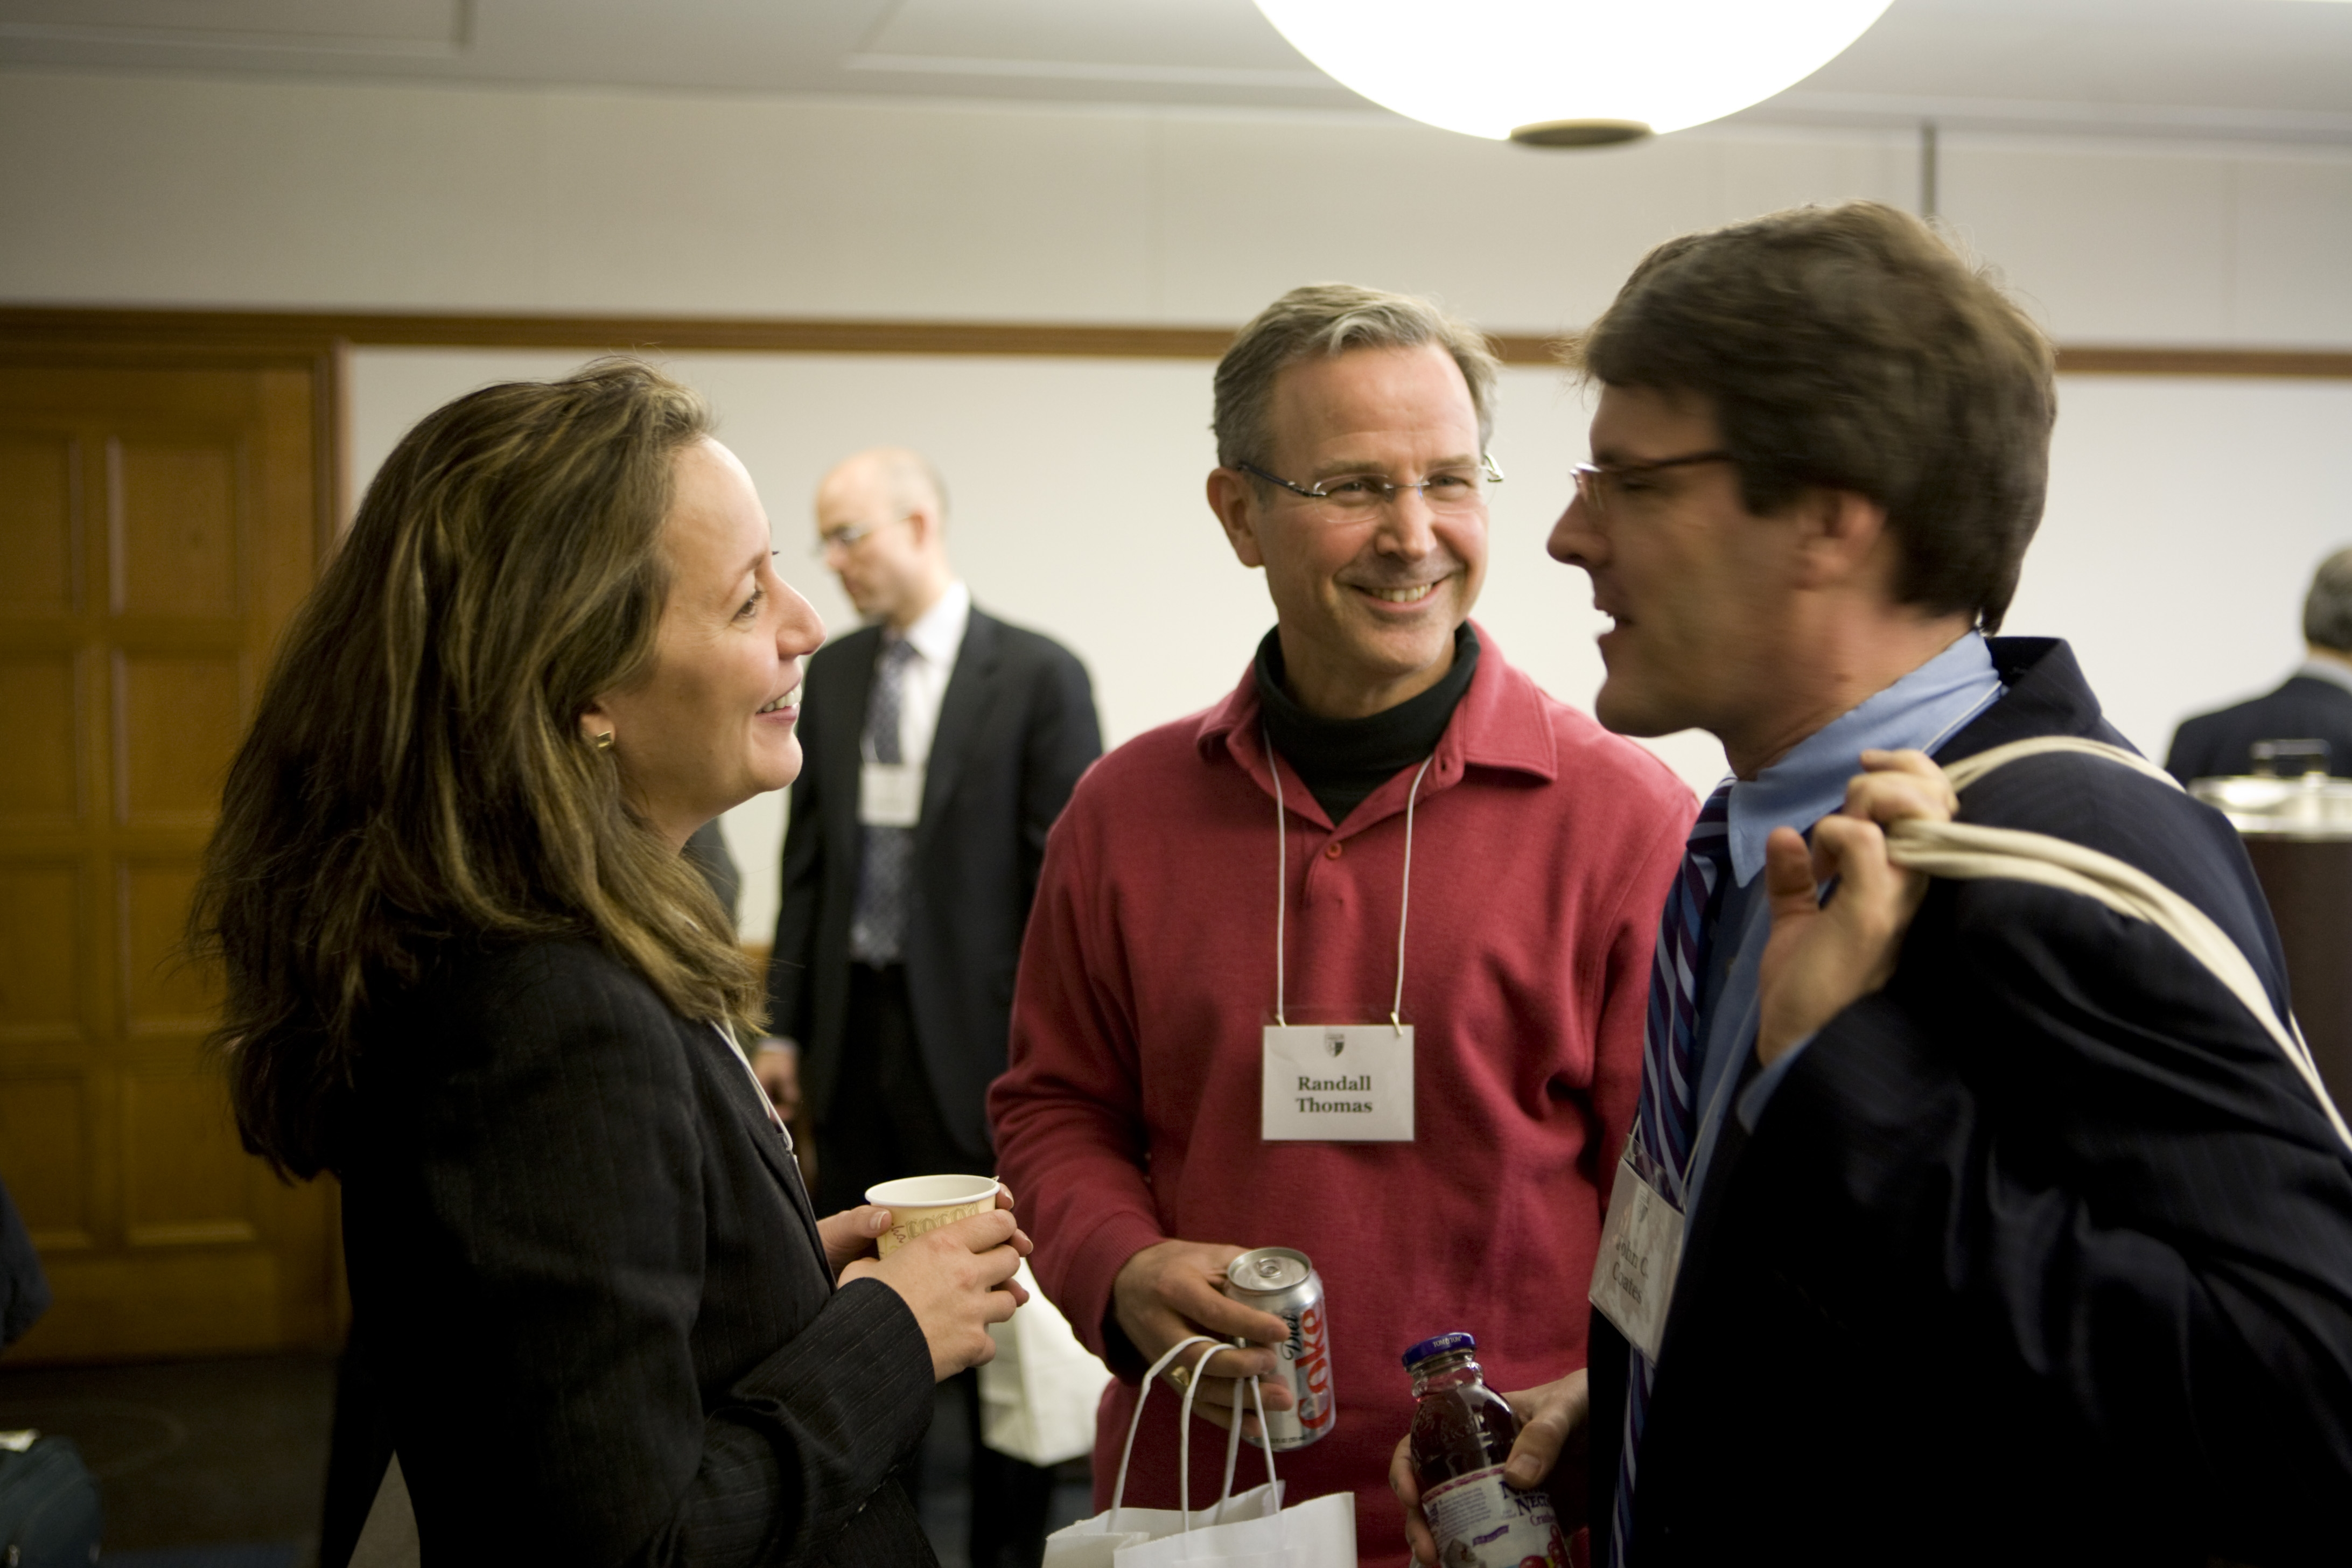 UVA Law Prof. Michal Barzuza, Vanderbilt Law Prof. Randall Thomas, and Harvard Law Prof. John Coates